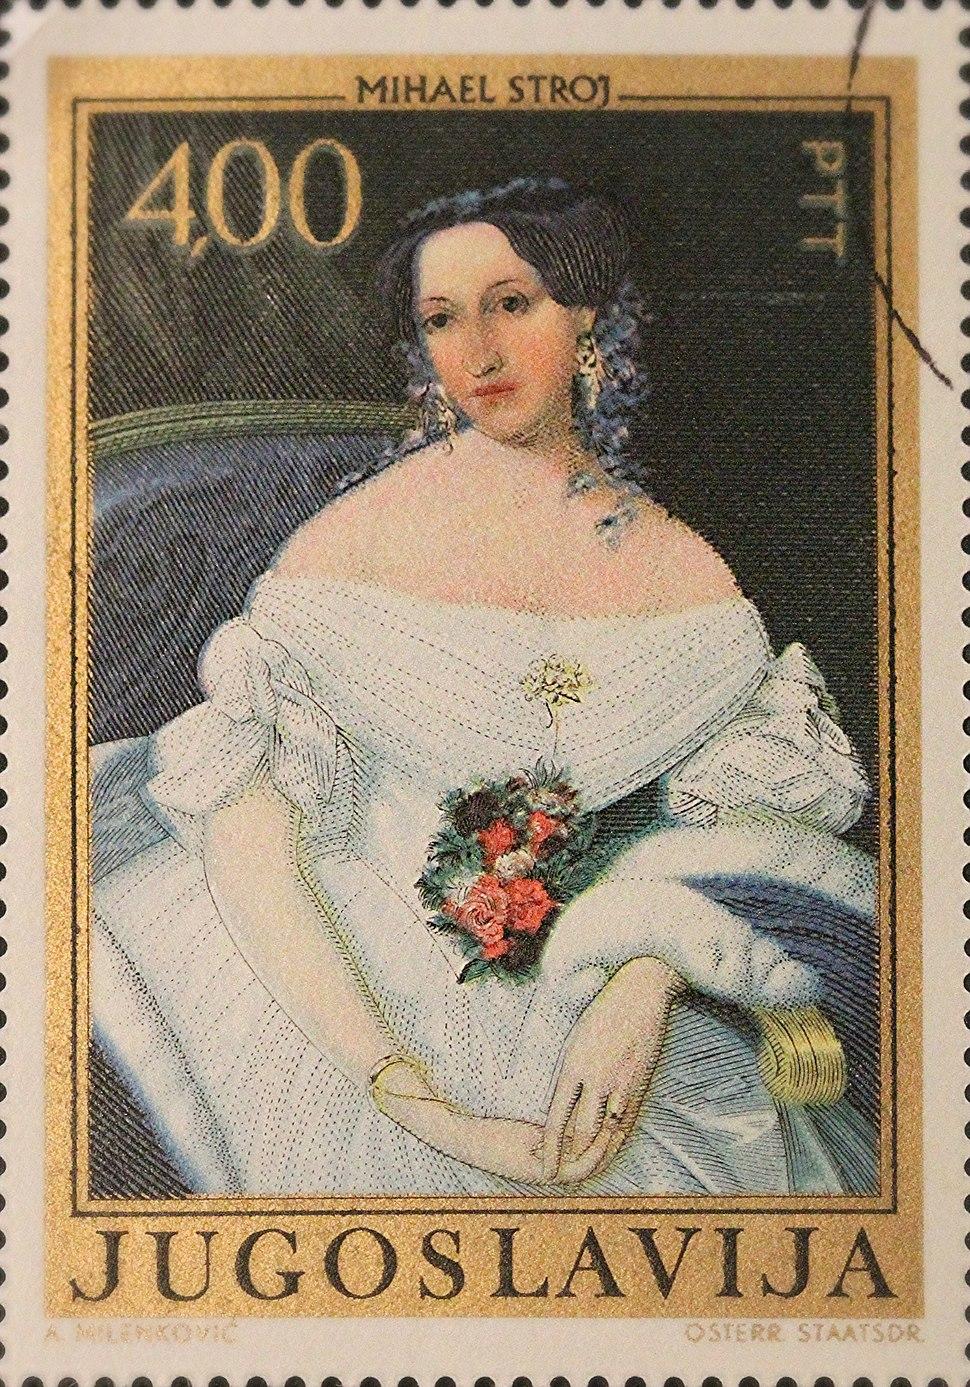 Yugoslavian stamp - Mihael Stroj